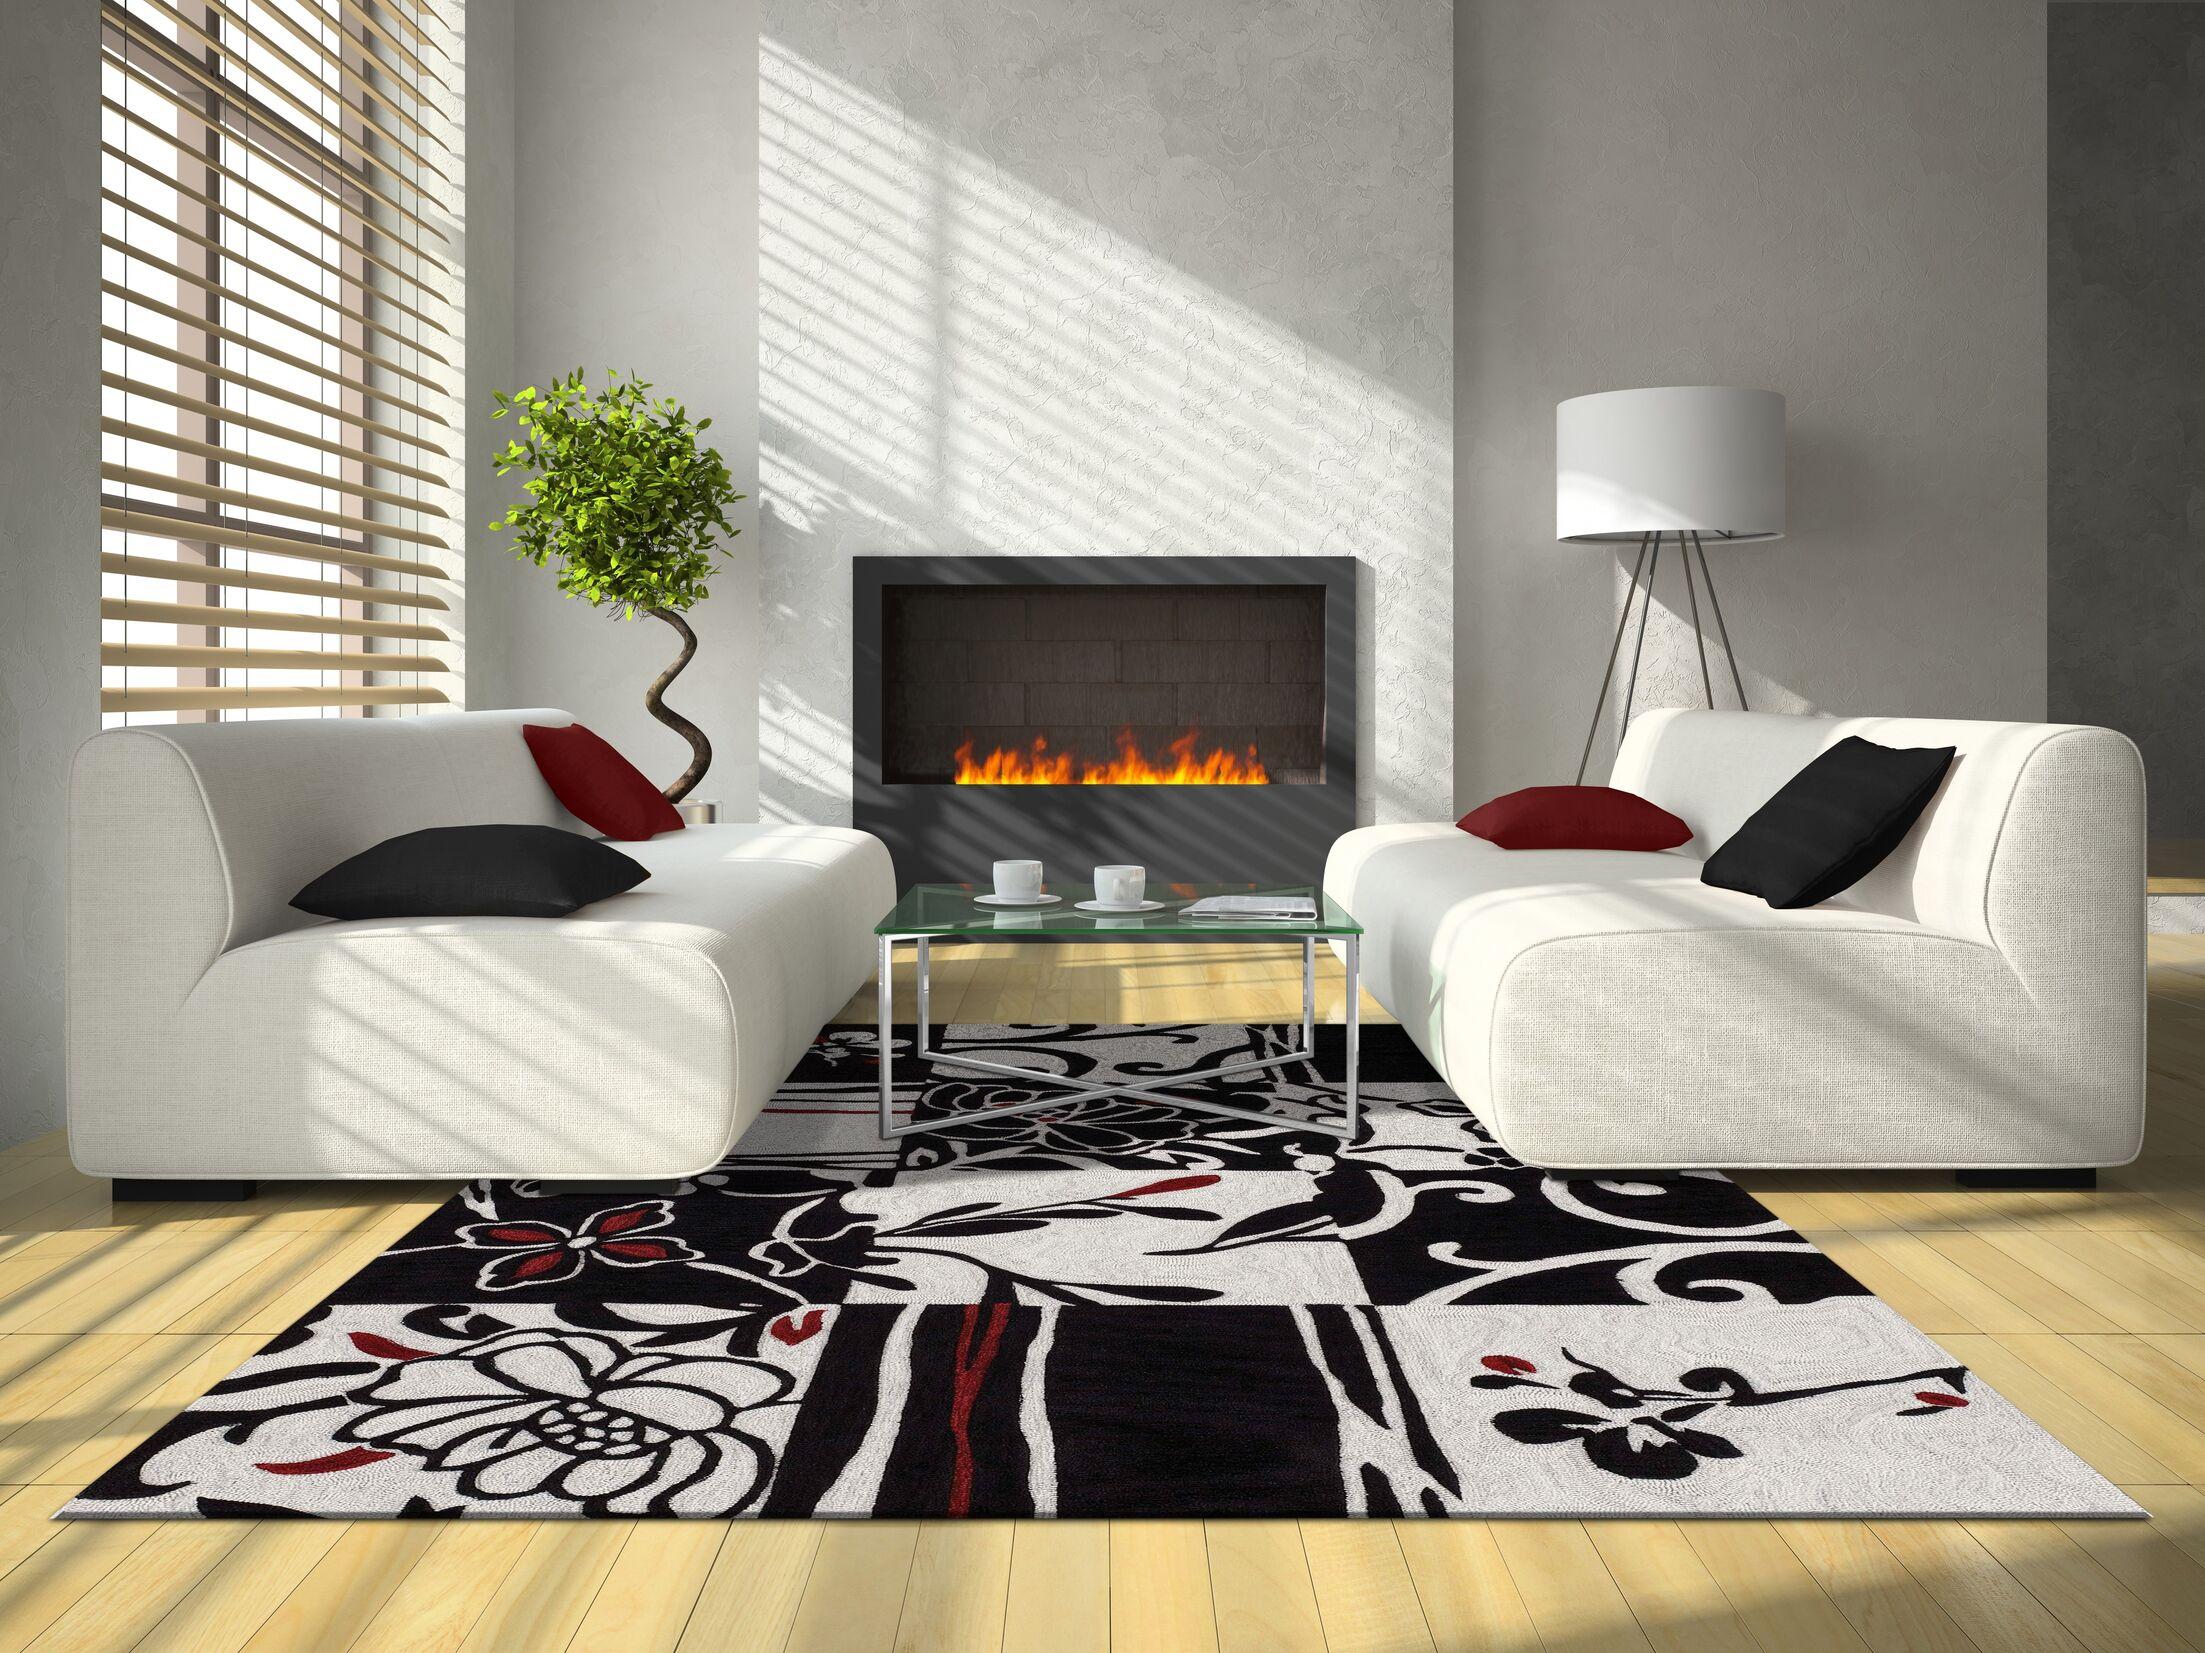 Studio Patchwork Black Area Rug Rug Size: Rectangle 9' x 13'